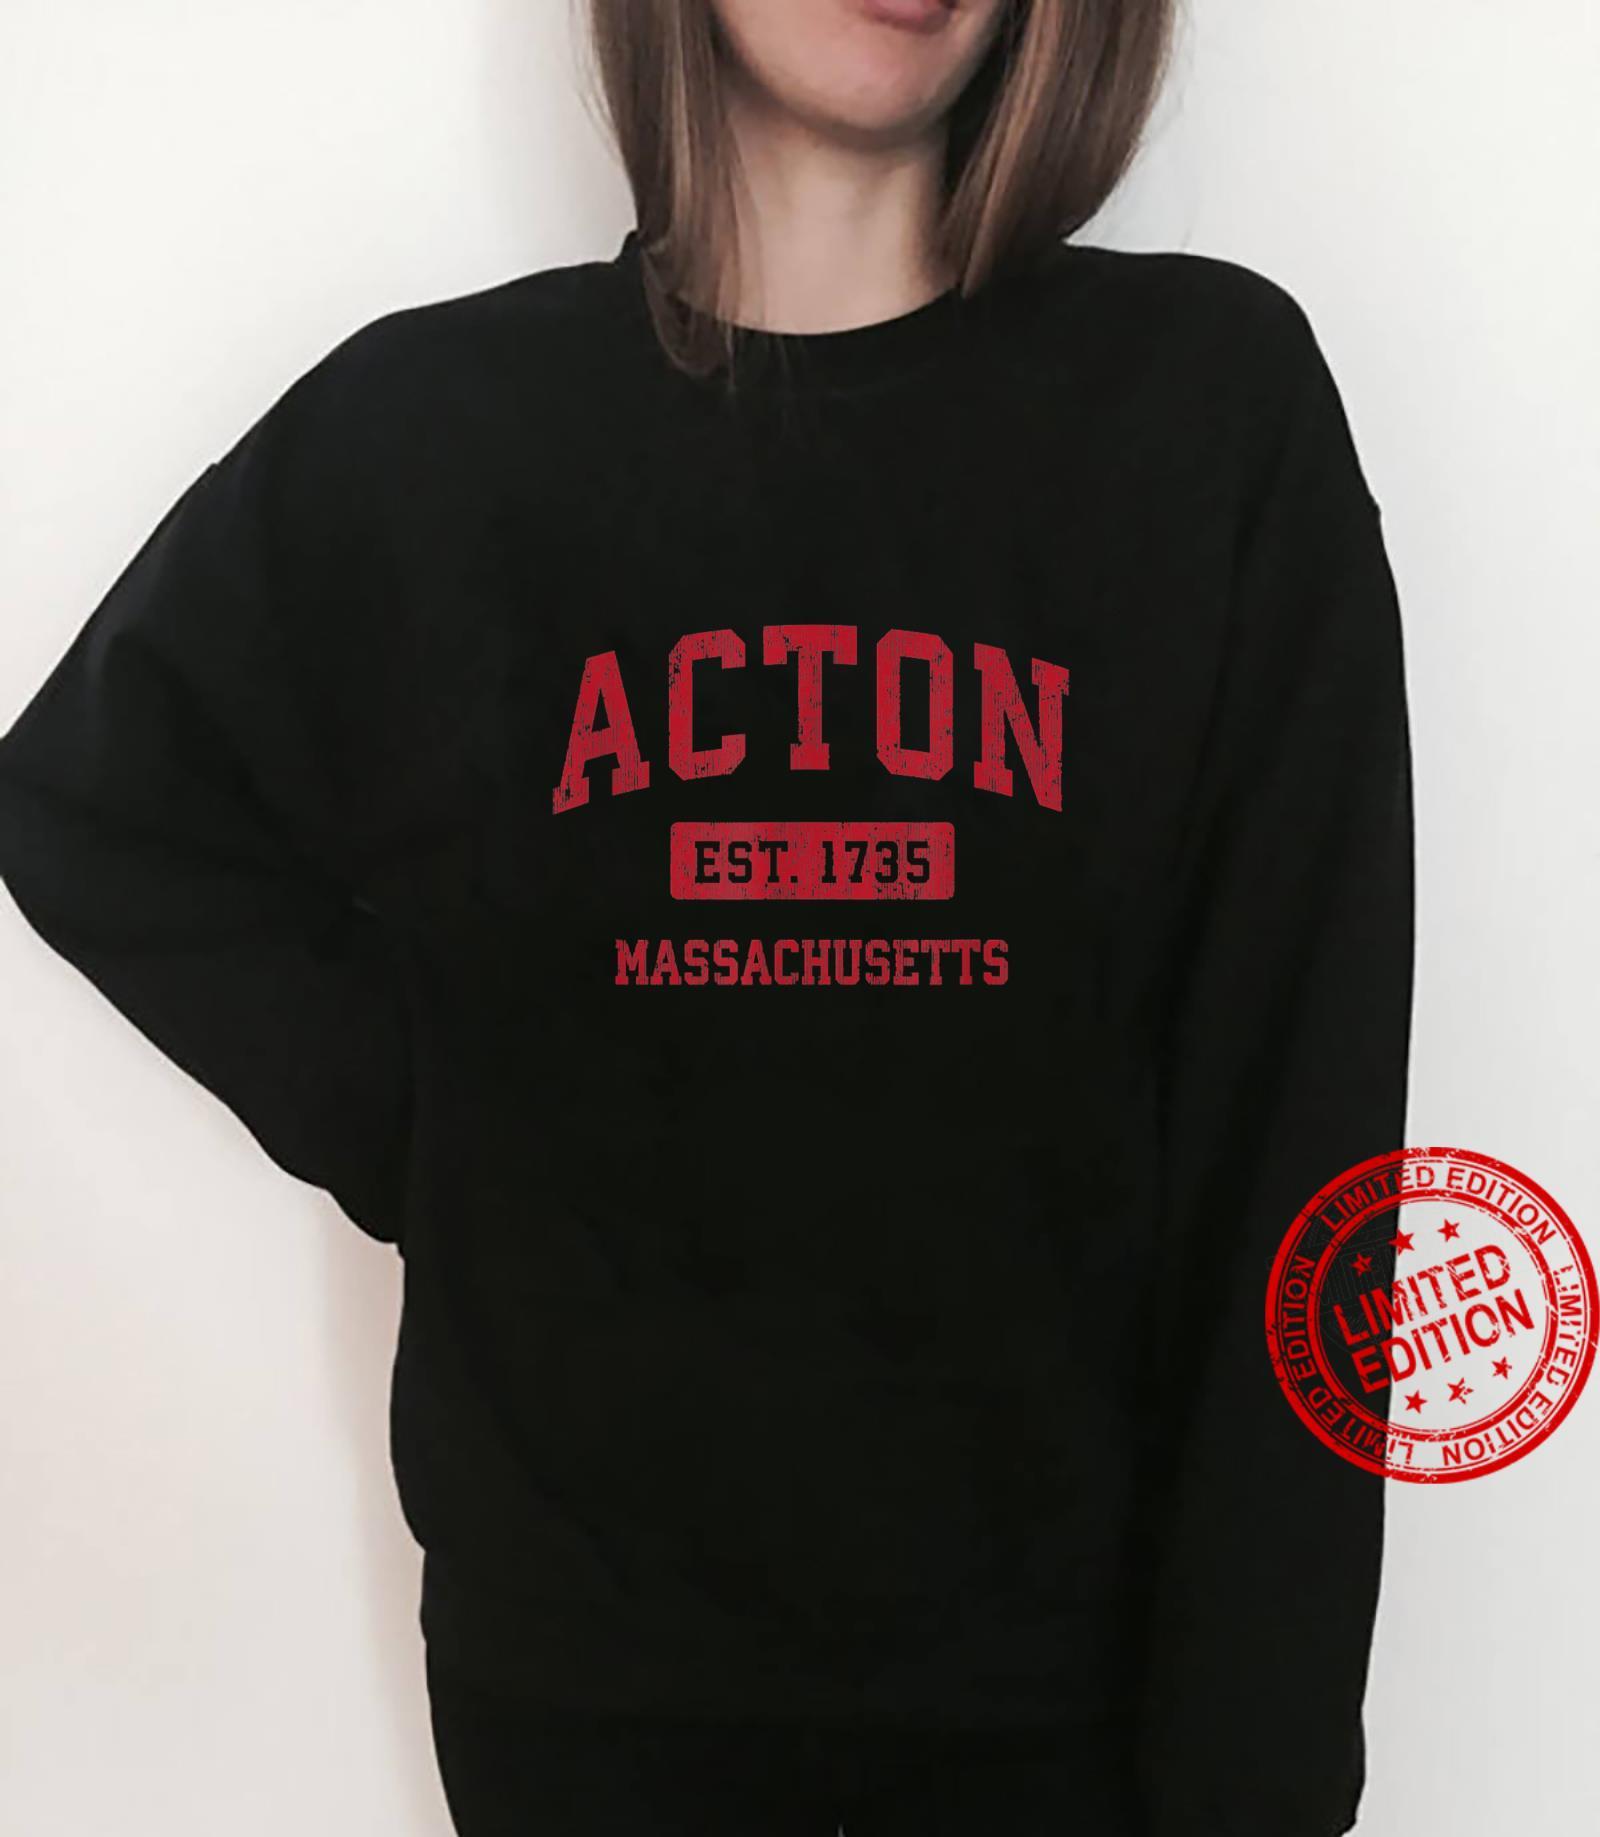 Acton Massachusetts MA Vintage Sports Design Red Design Shirt sweater